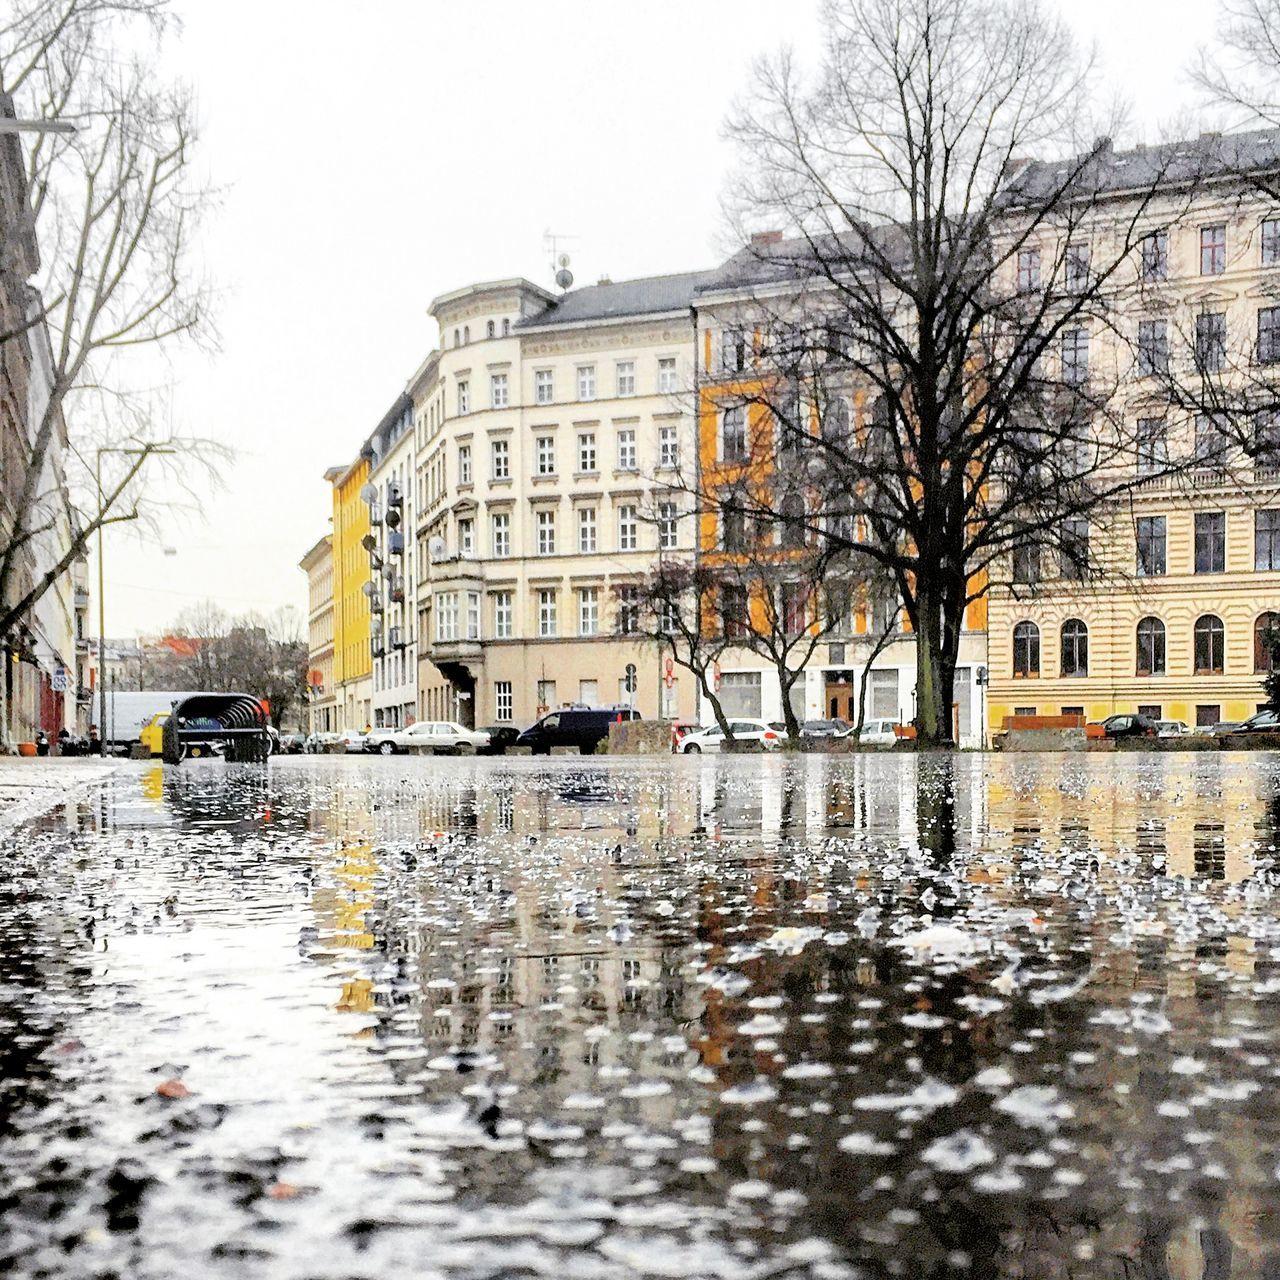 Showcase: February Berlin Berliner Ansichten Berlin Kreuzberg Puddle Reflection